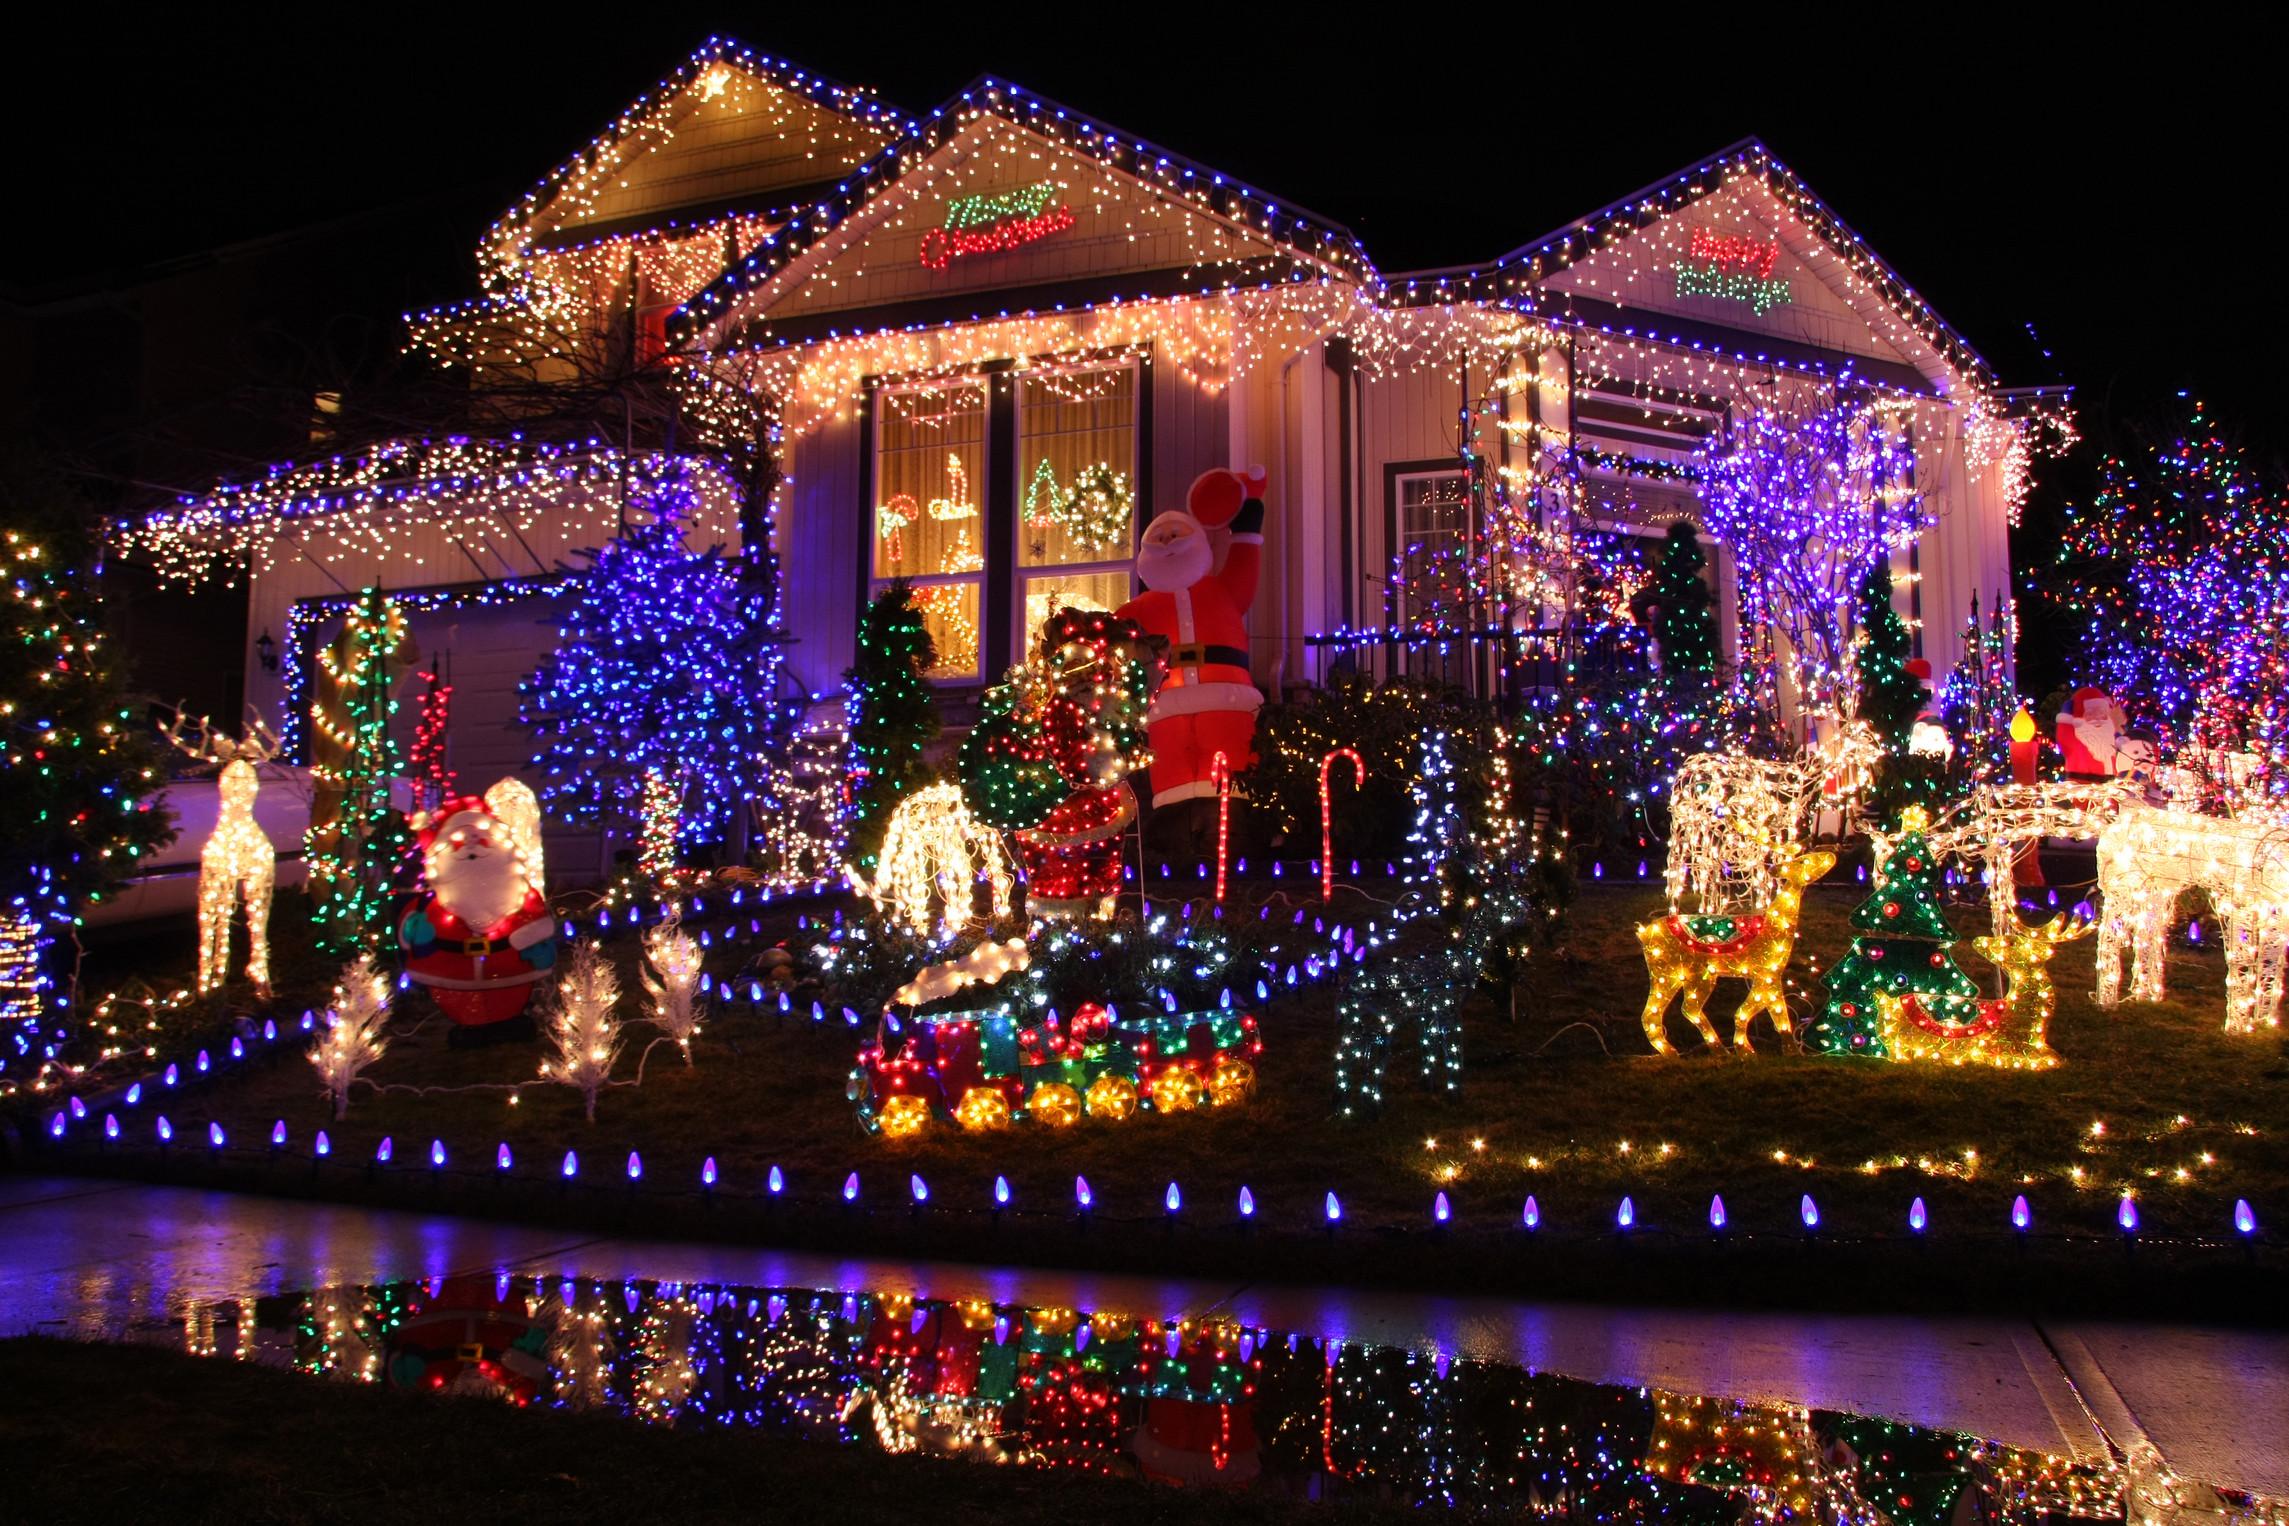 HomeDabbler | Tips for hanging Christmas lights safely